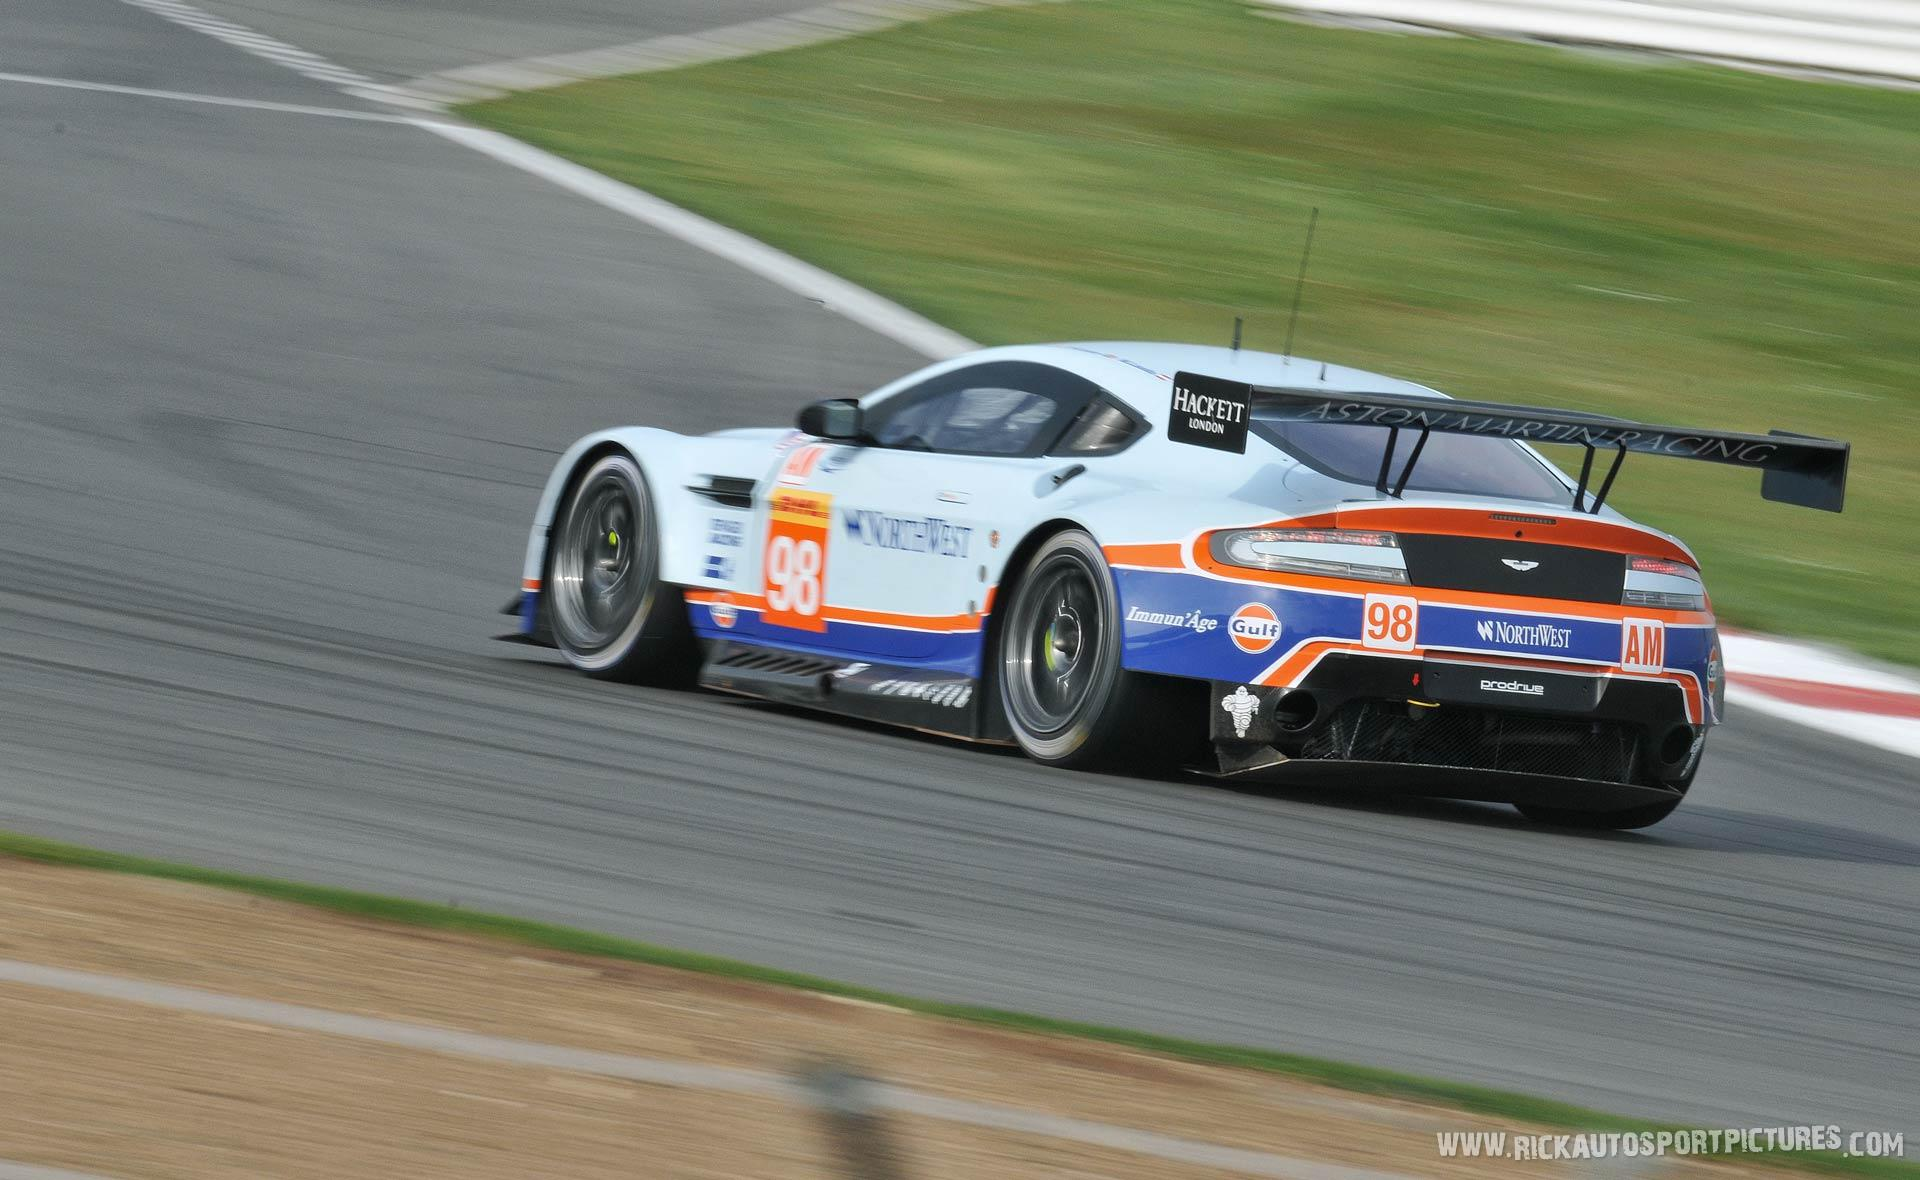 Aston Martin Racing WEC silverstone 2015